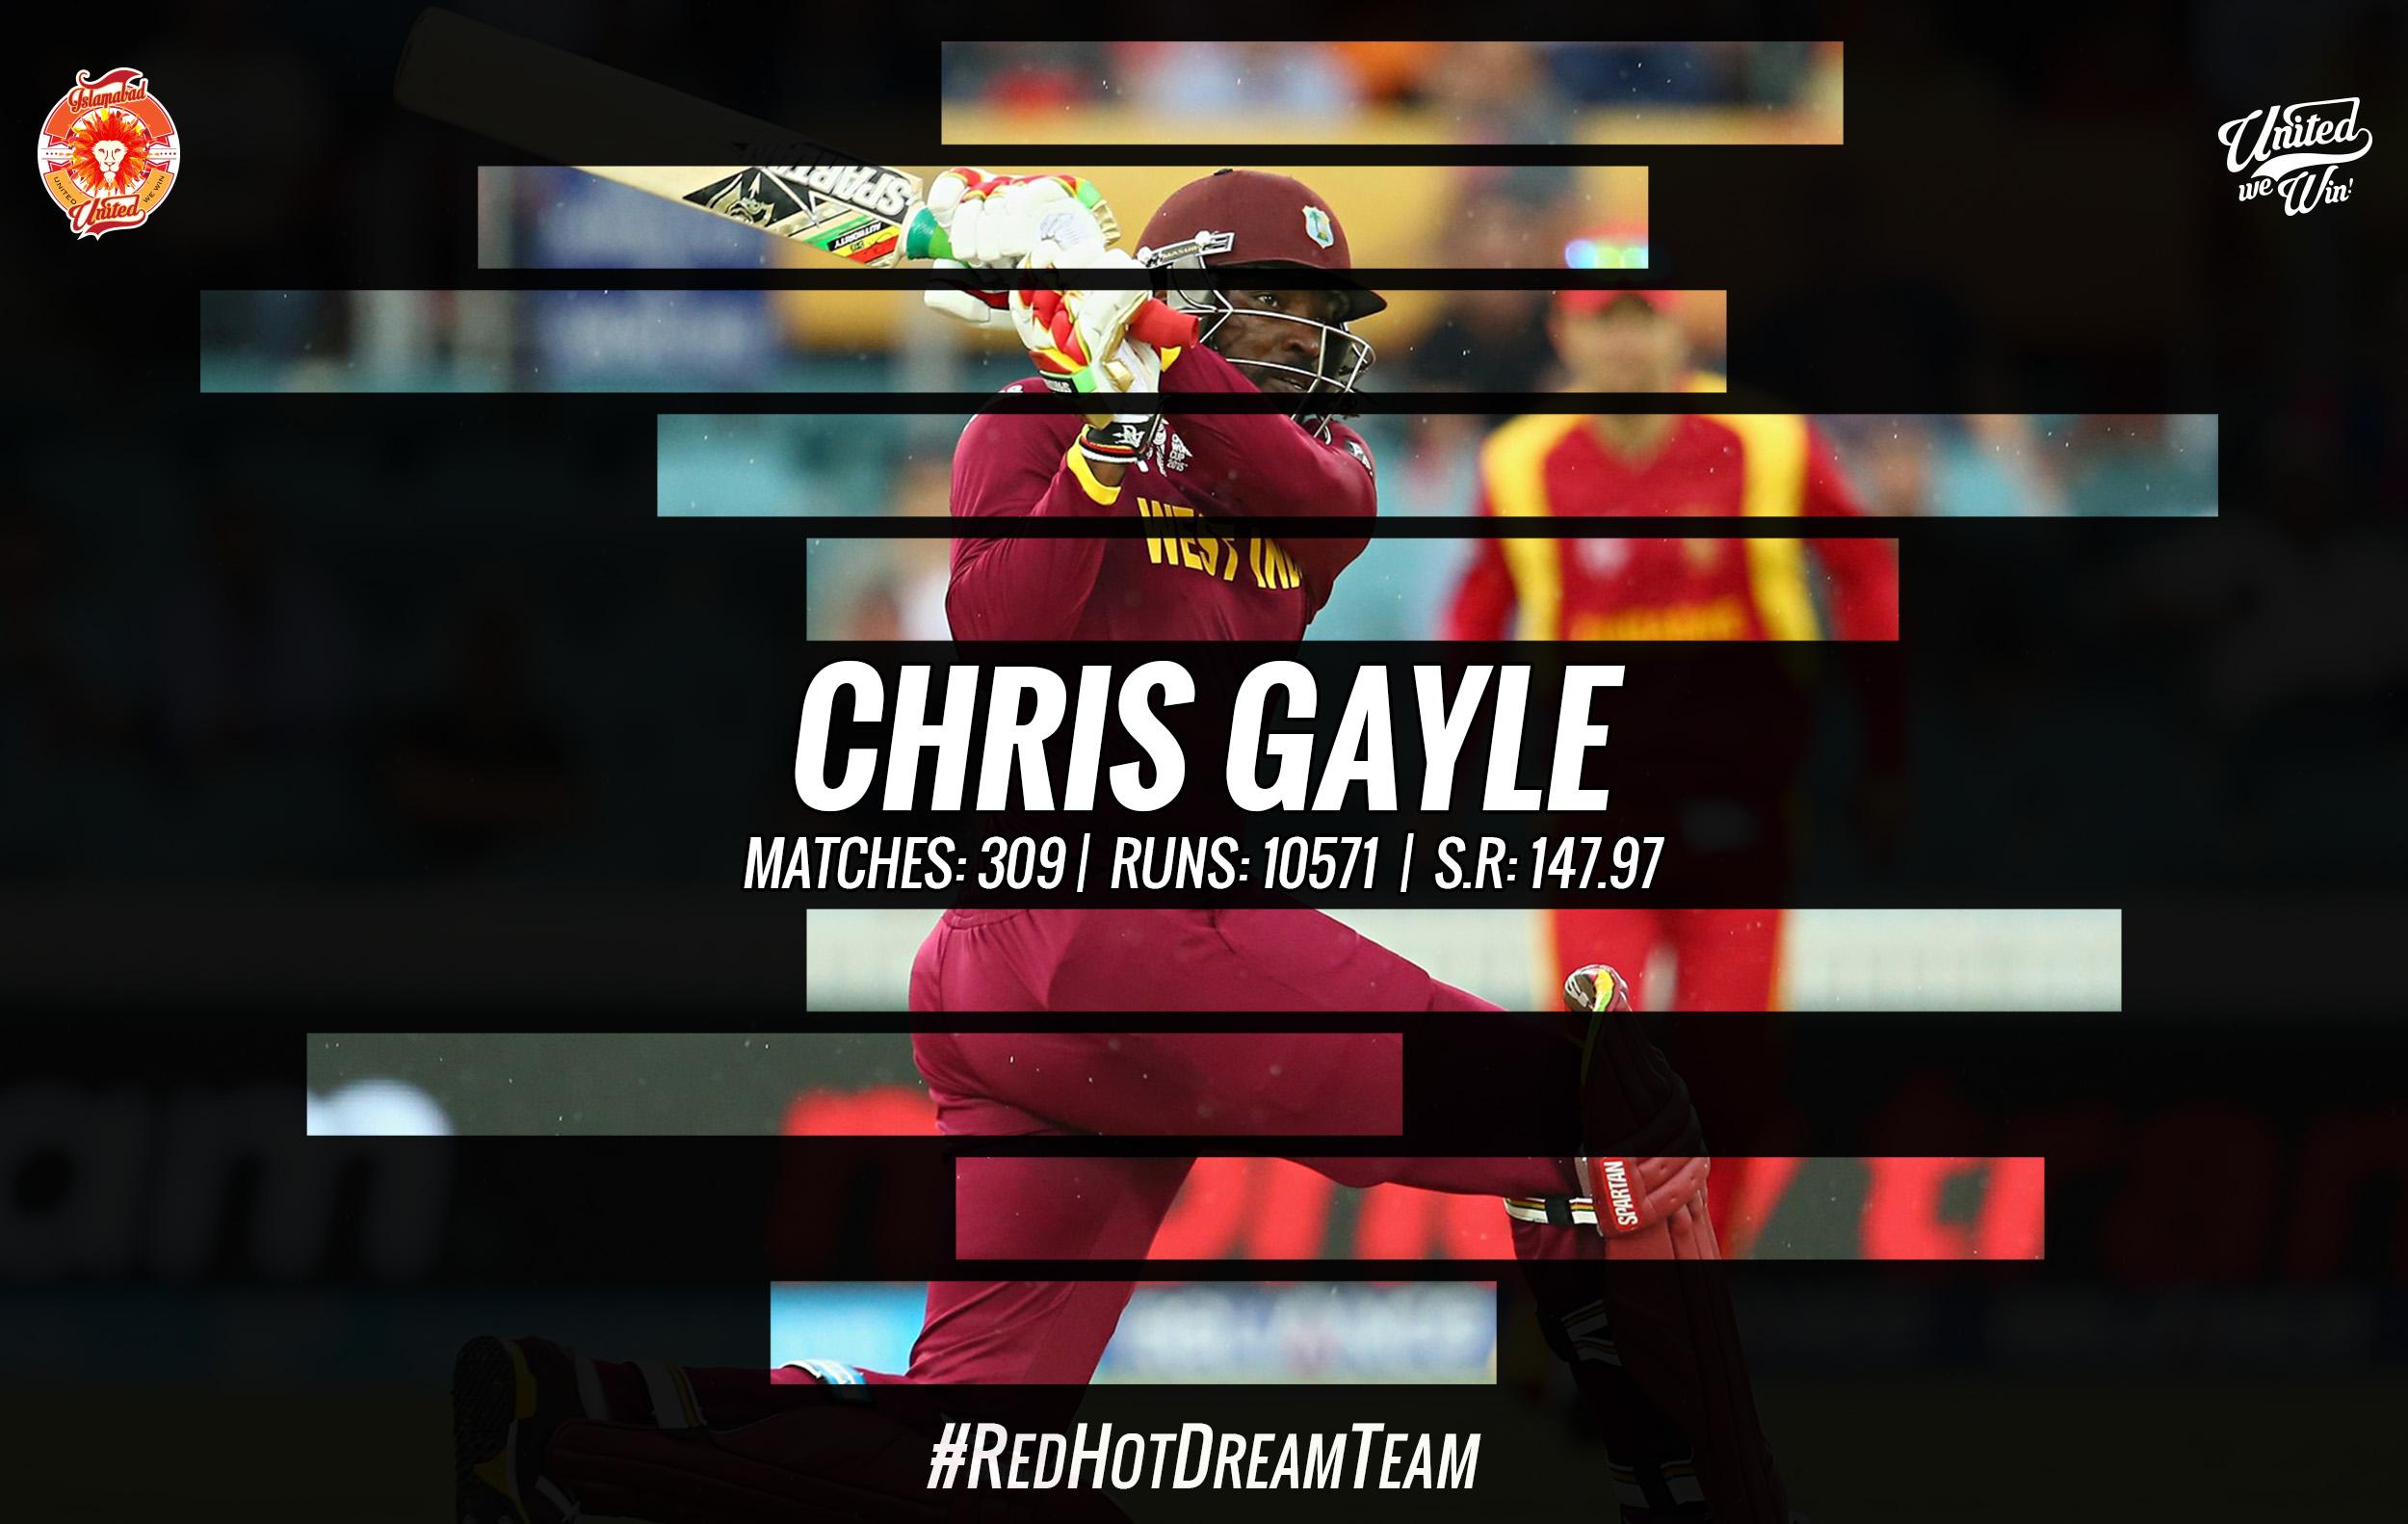 Chris Gayle